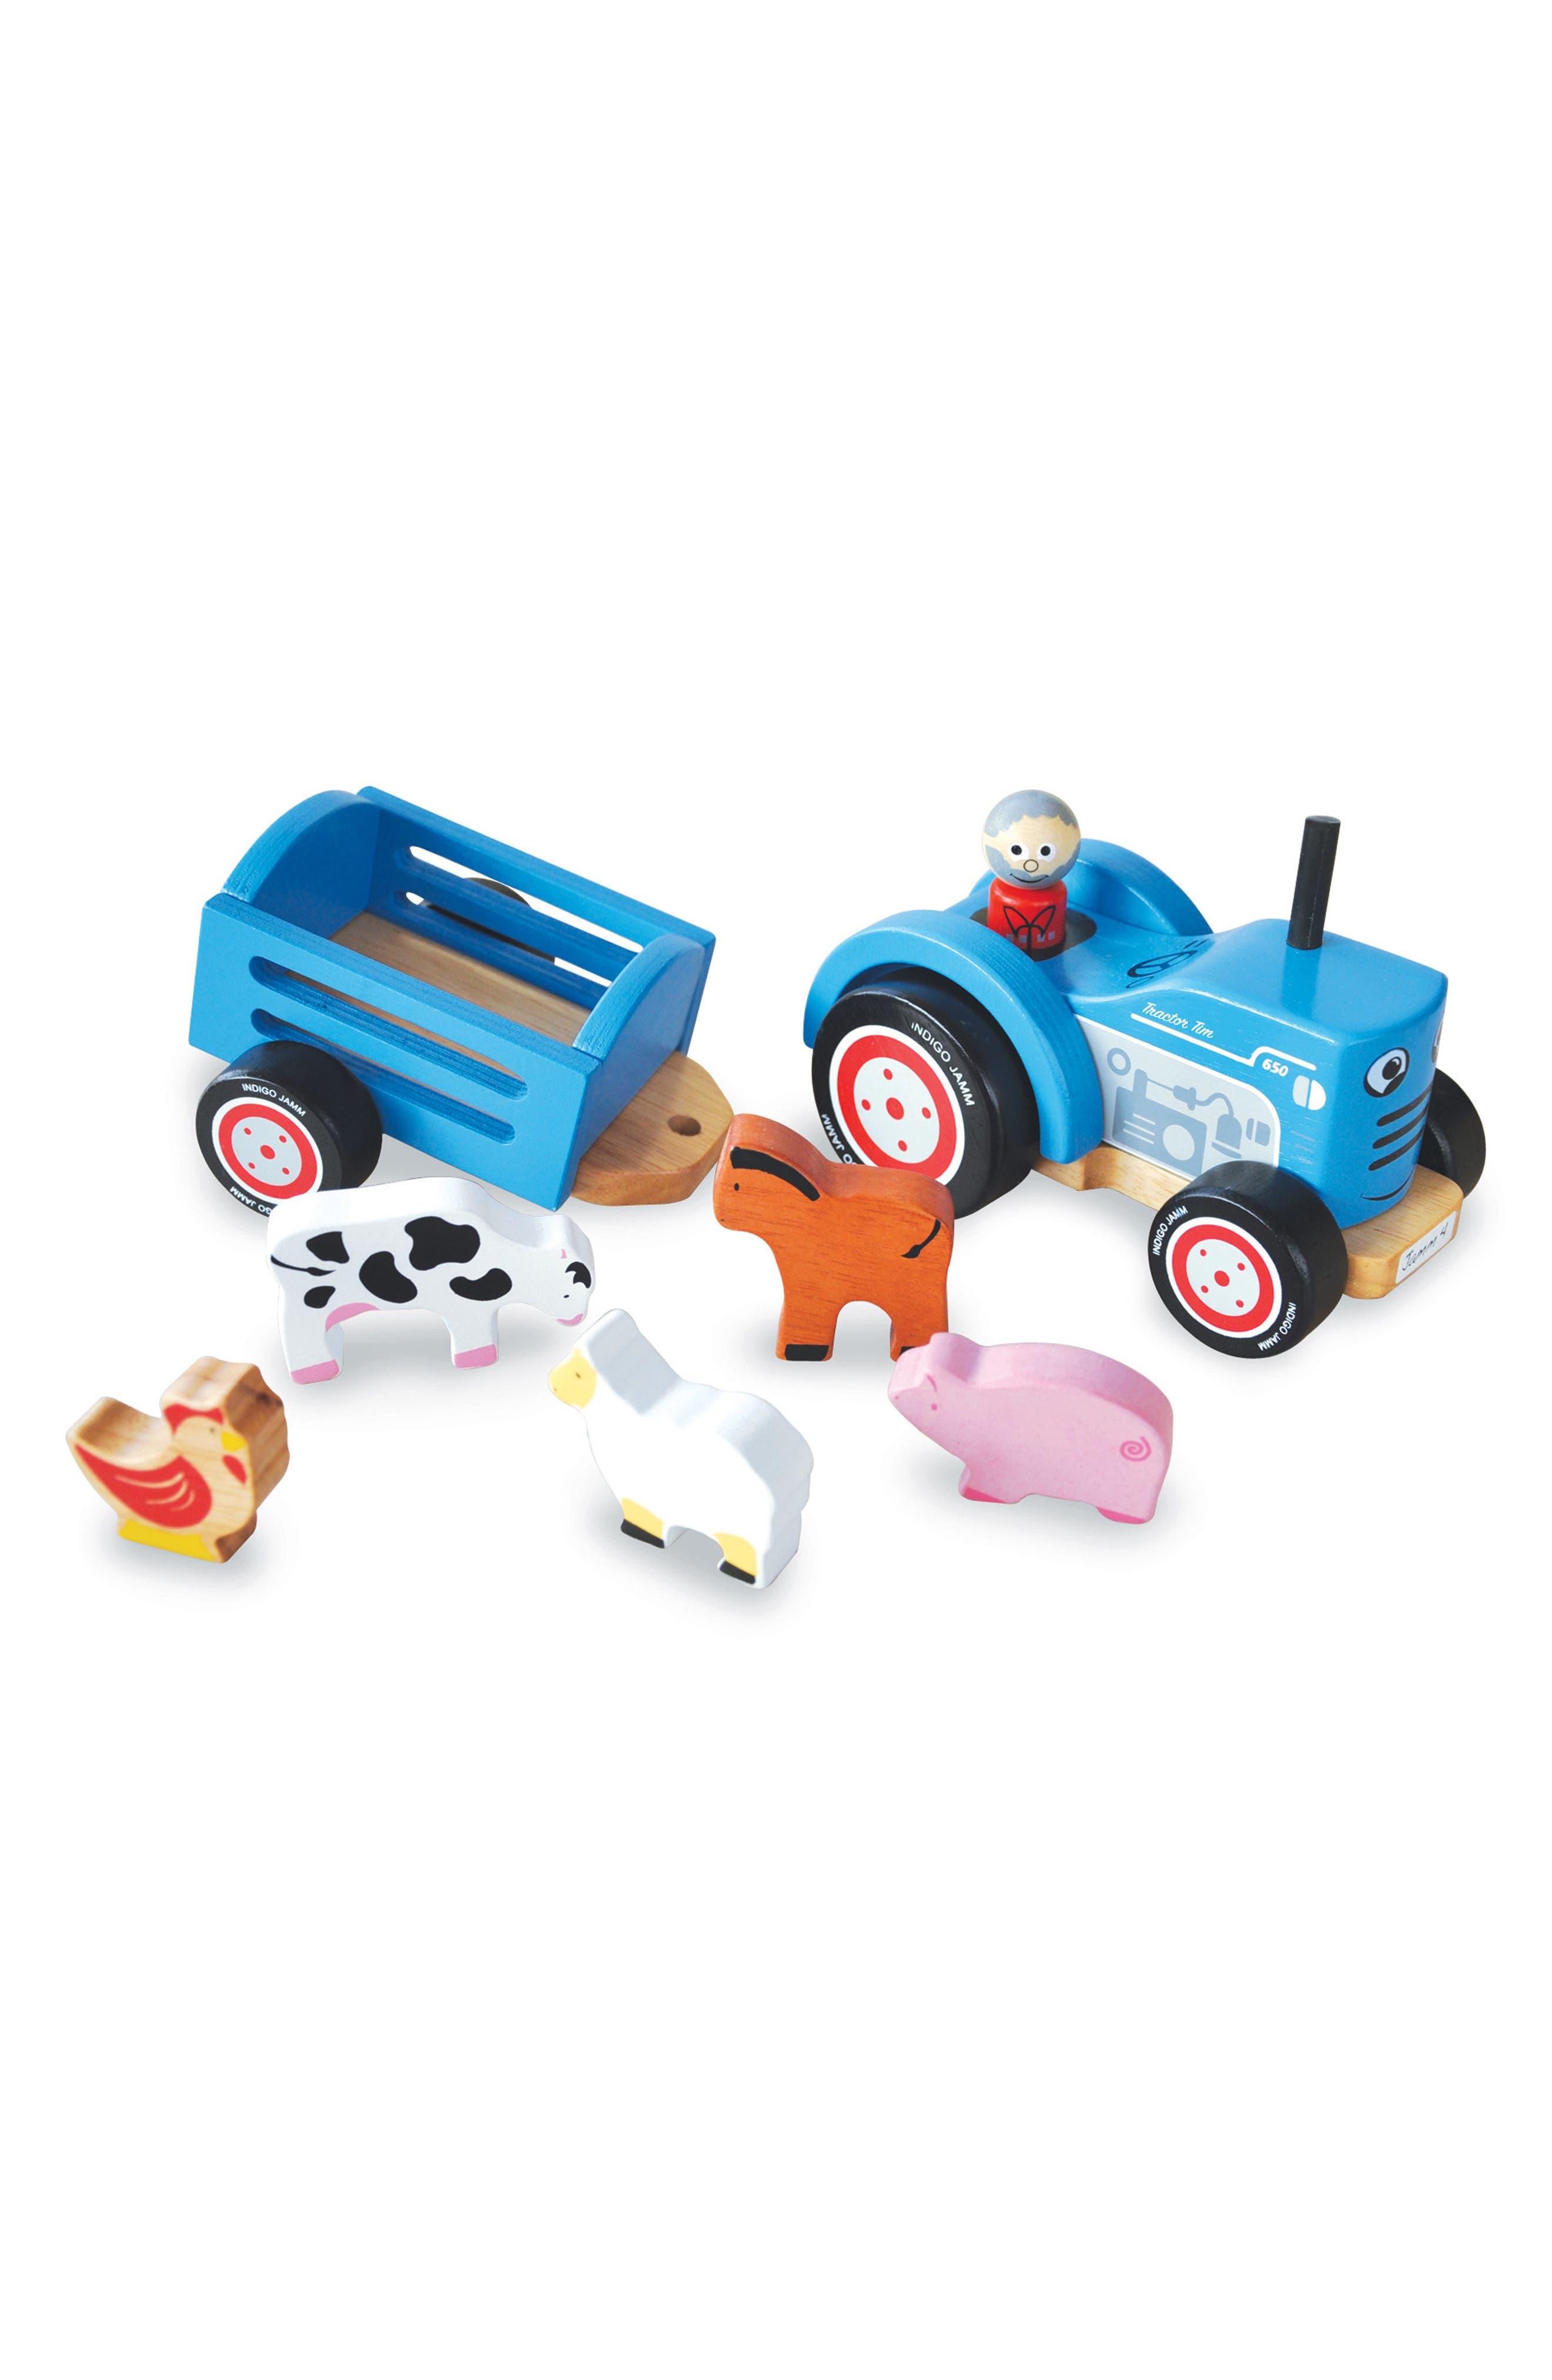 Wooden 8-Piece Farm Tractor Play Set,                             Main thumbnail 1, color,                             Blue